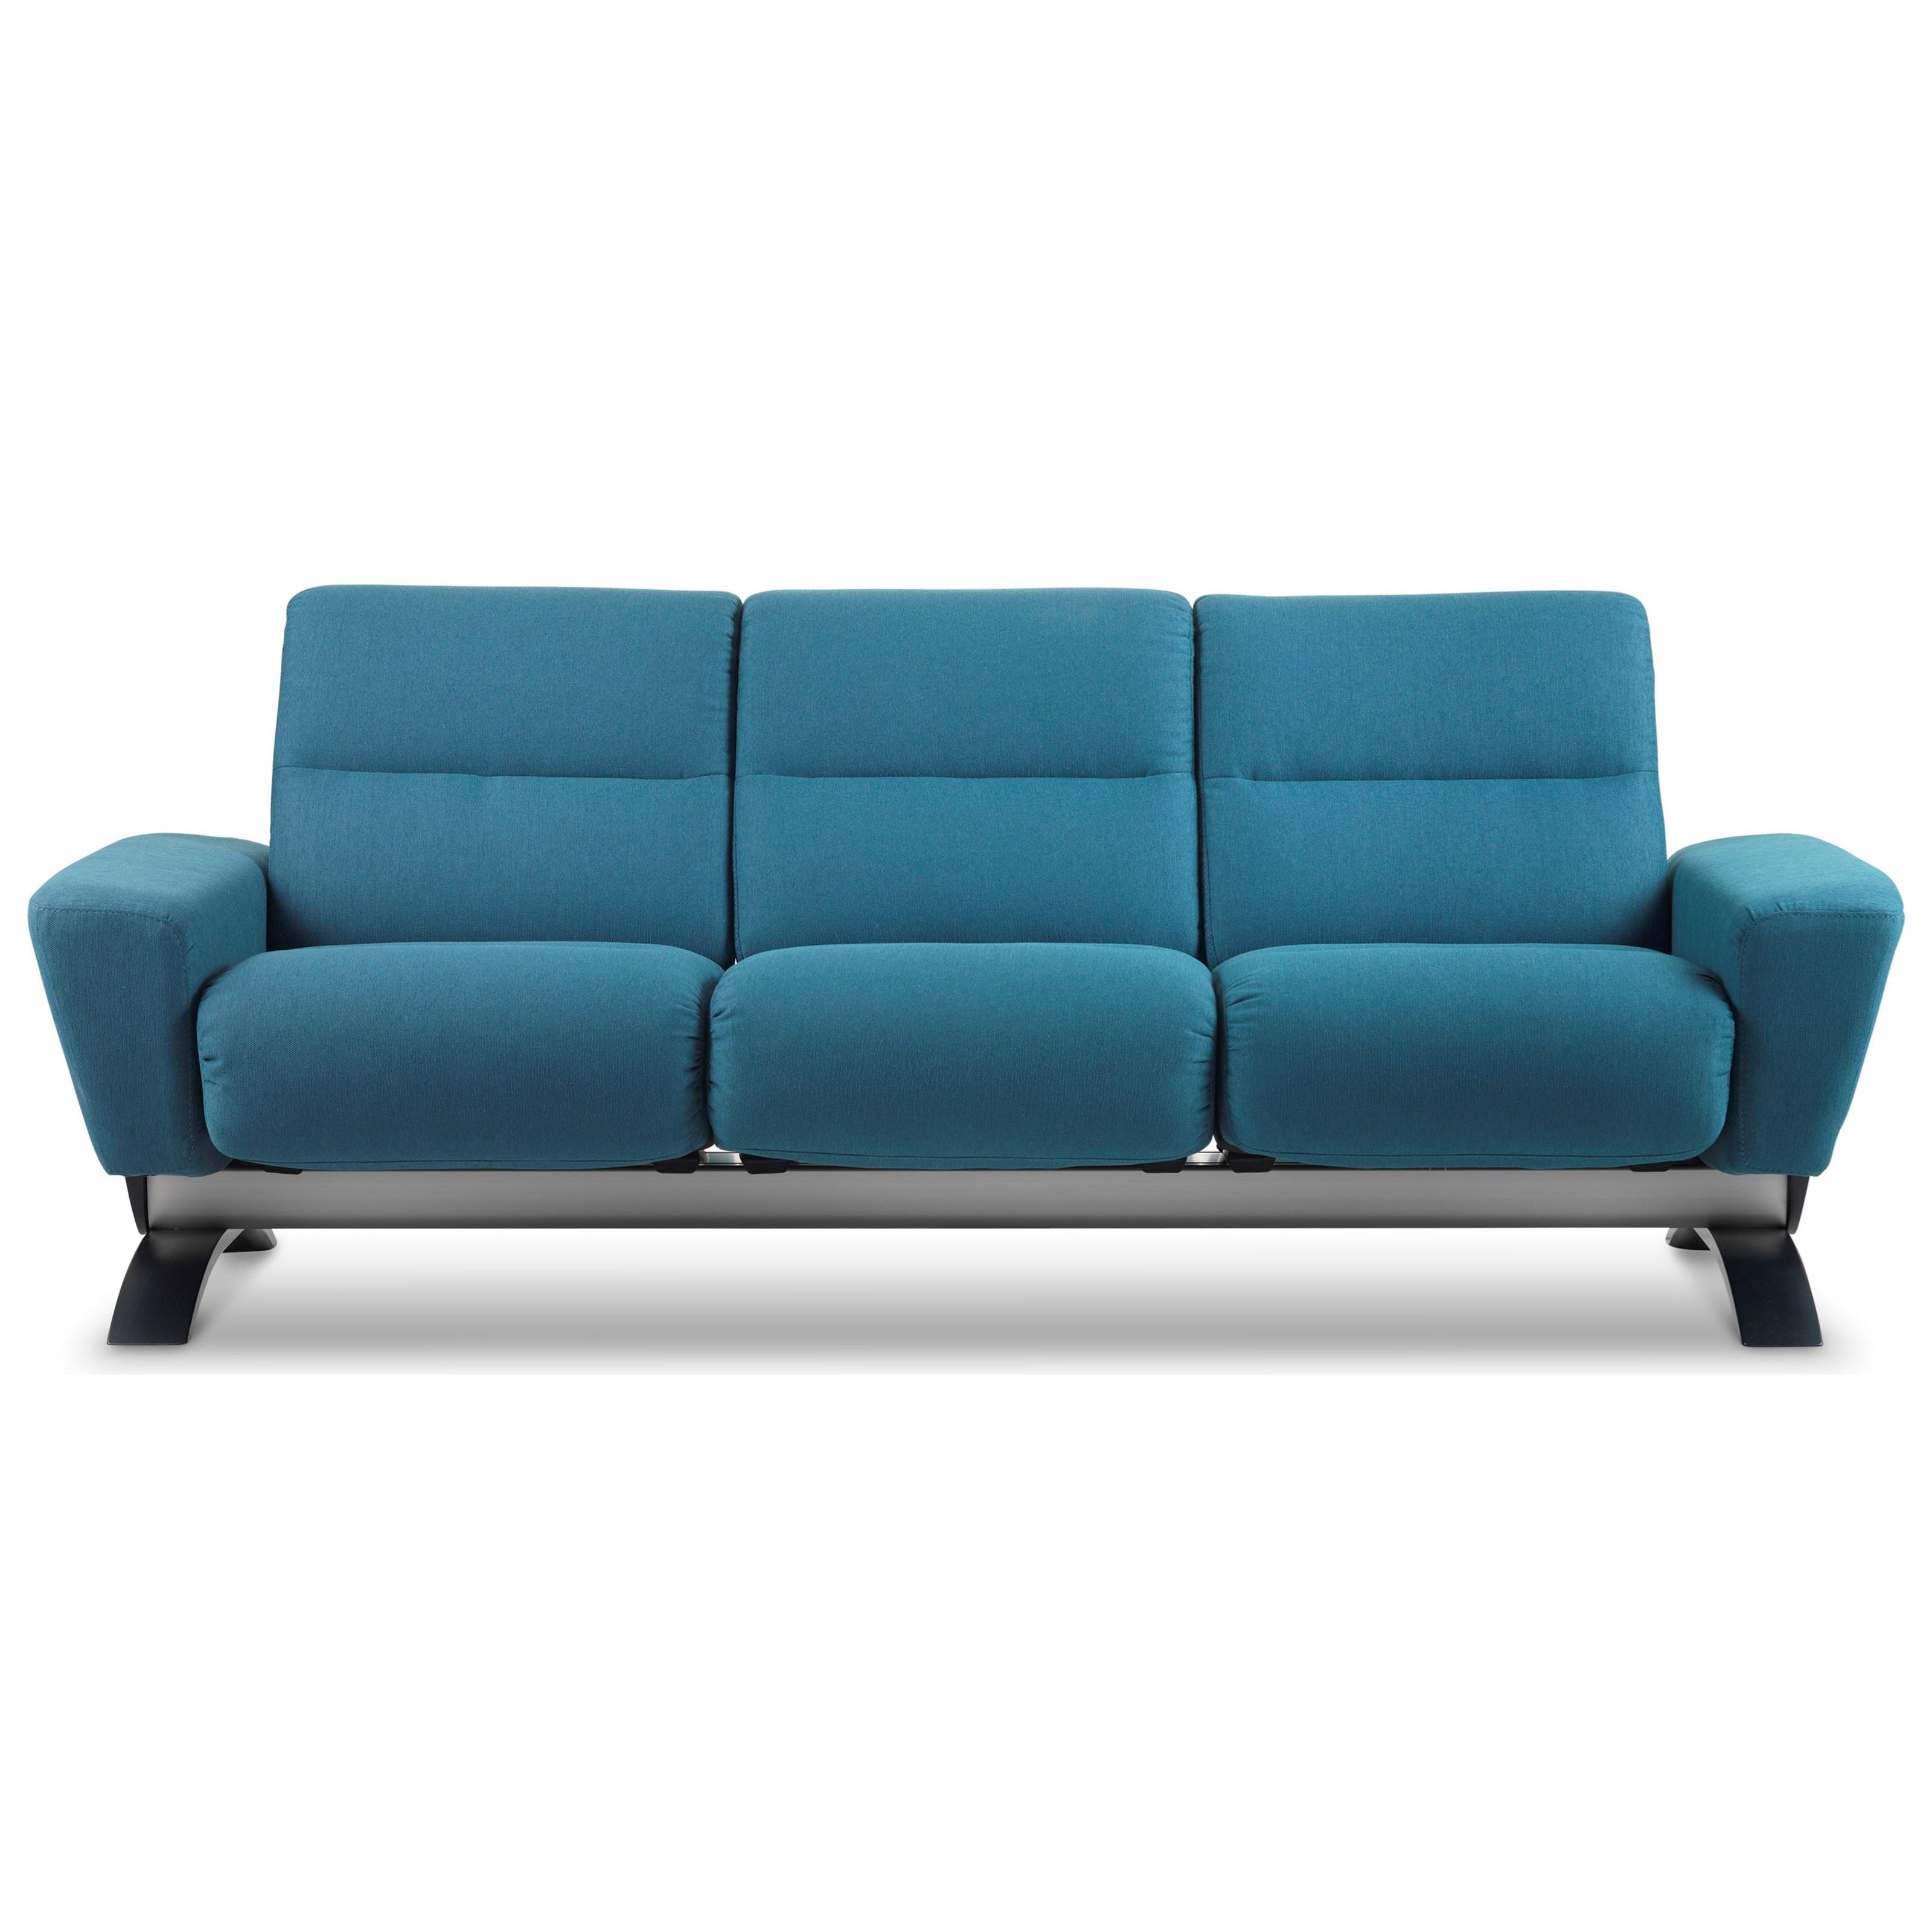 Ordinaire Stressless Stressless You Julia 3 Seater Sofa   Item Number: YOU JULIA